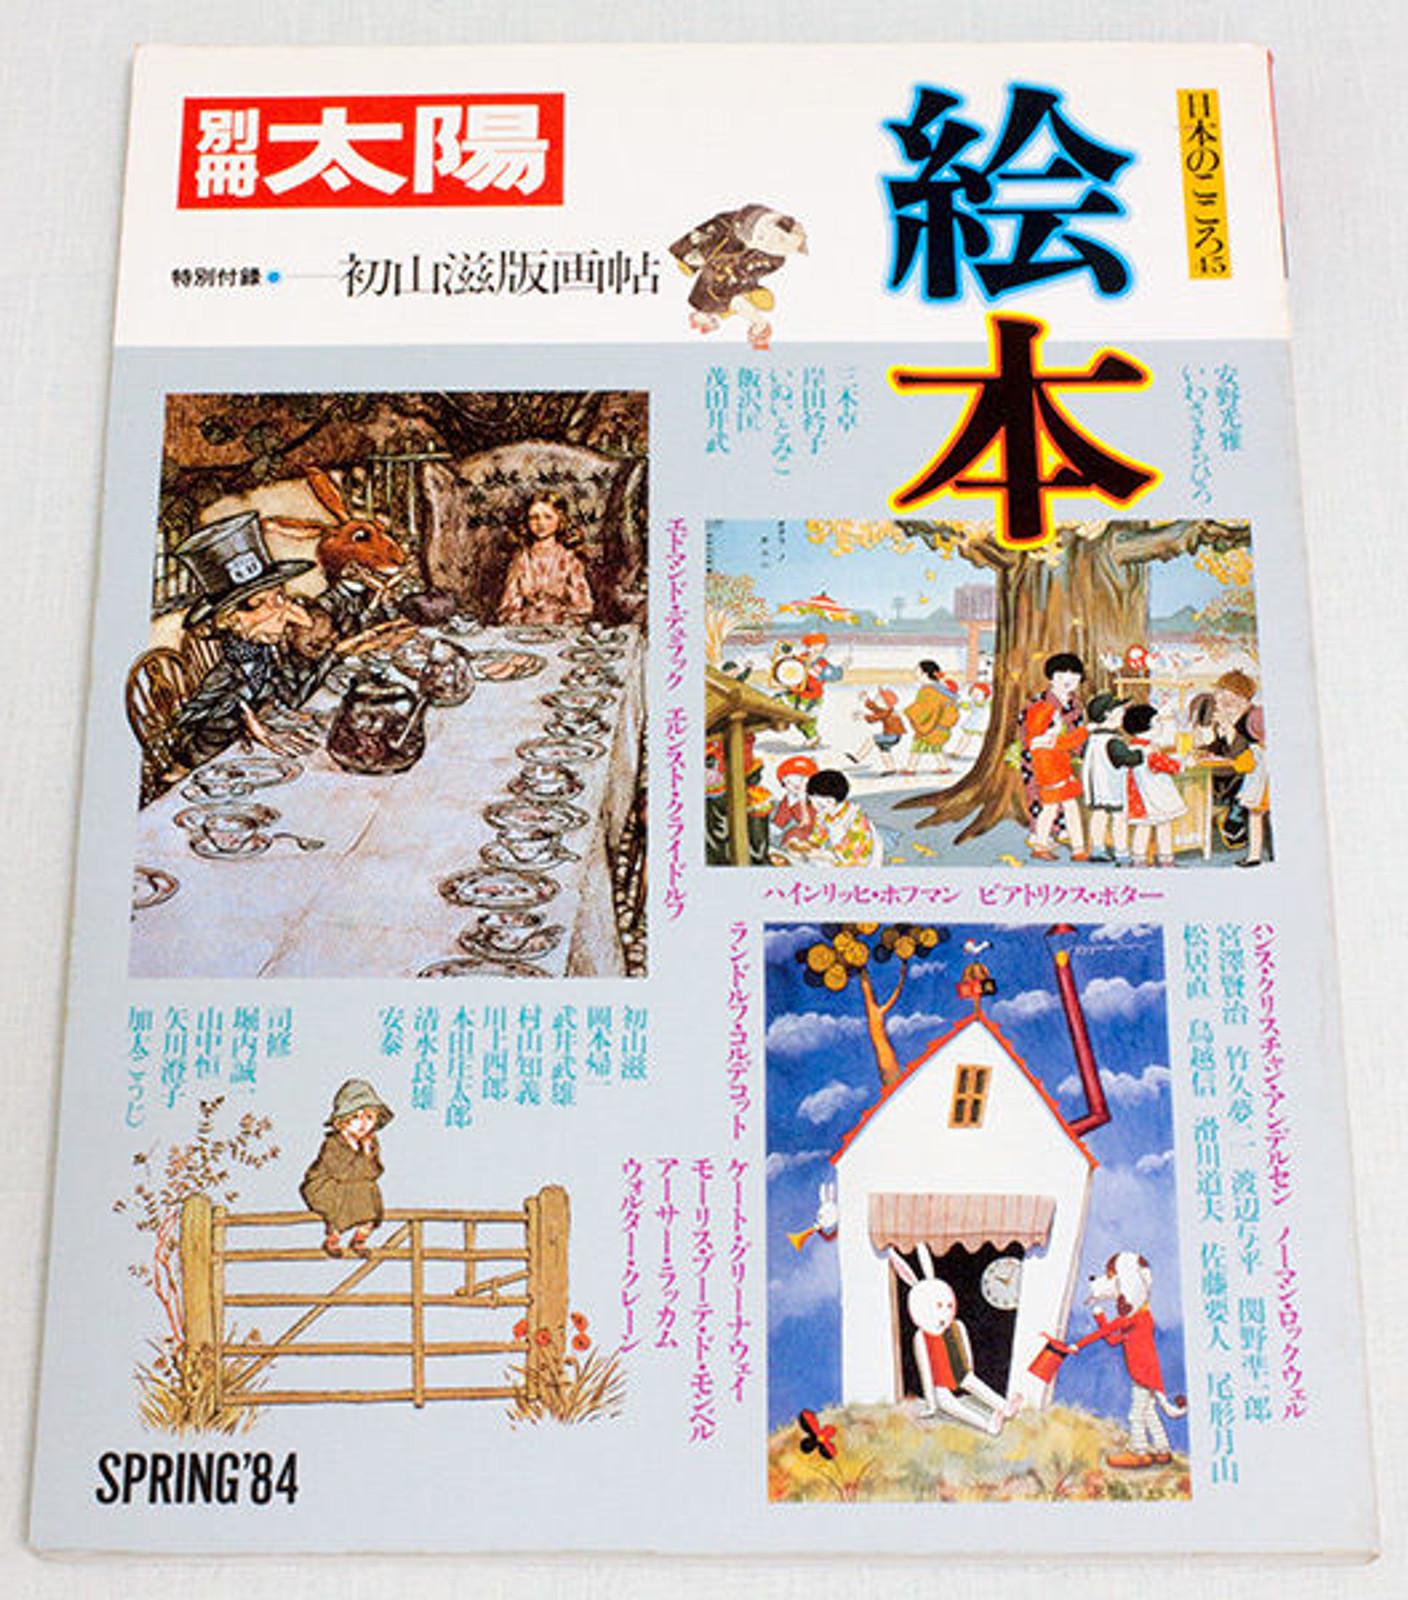 Taiyo Magazine Soul of Japan Vol.45 1984 Picture Book JAPAN